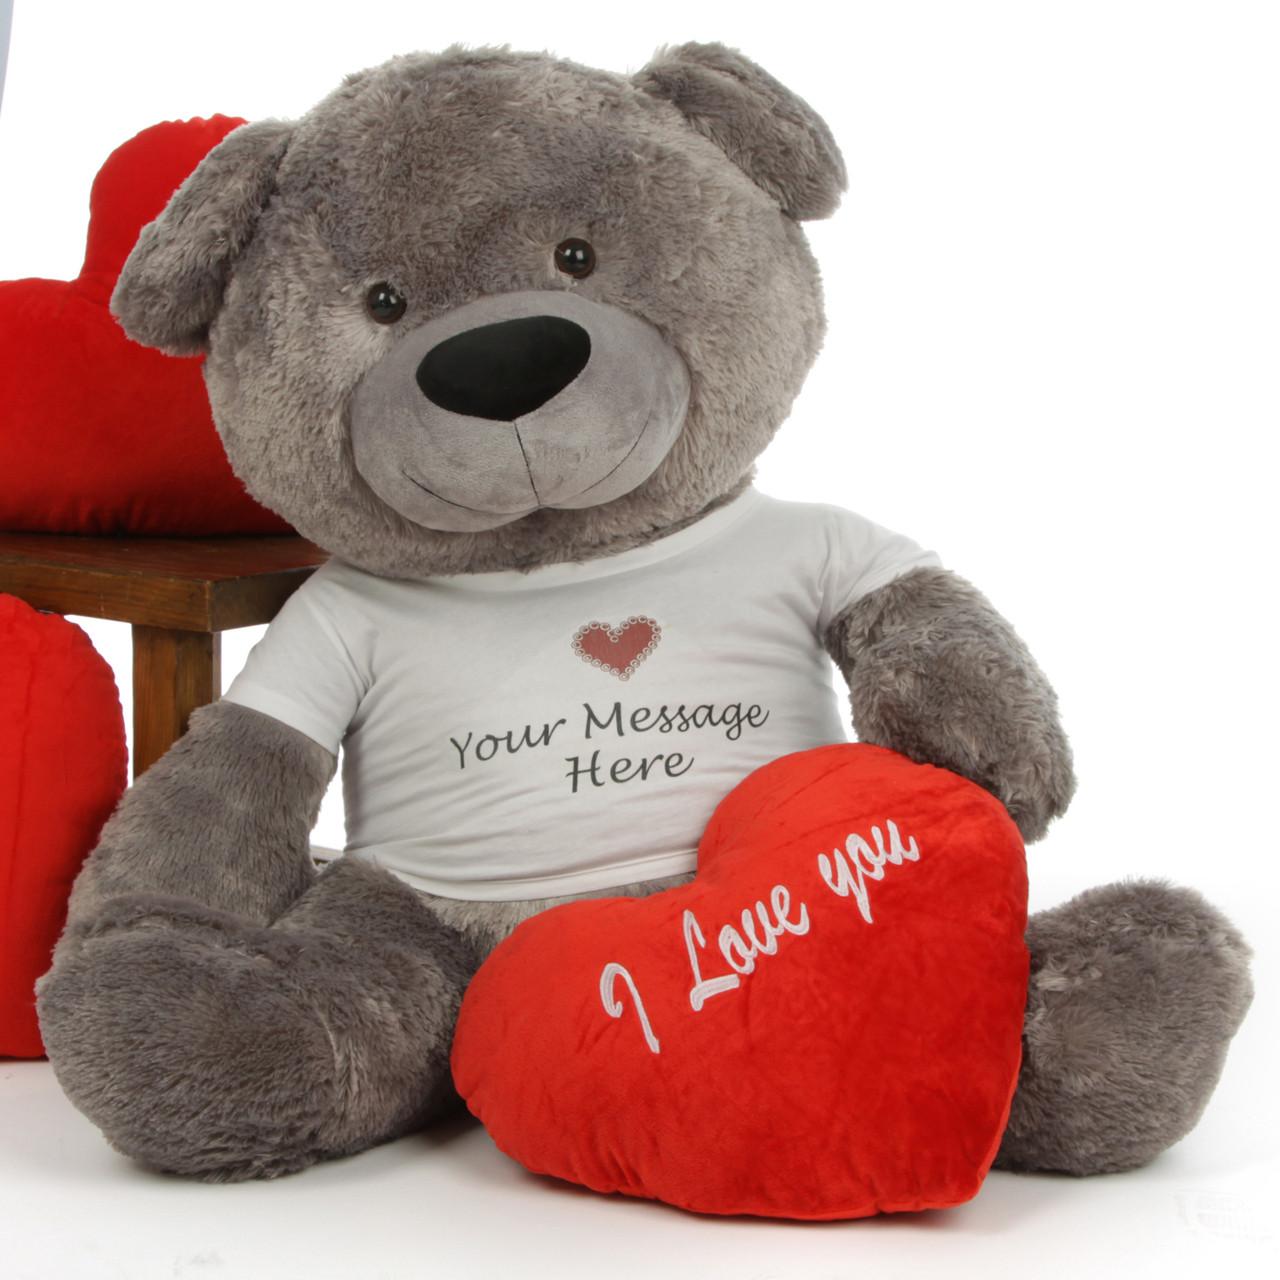 Diamond Shags Personalized Valentine's Day Teddy Bear 45in